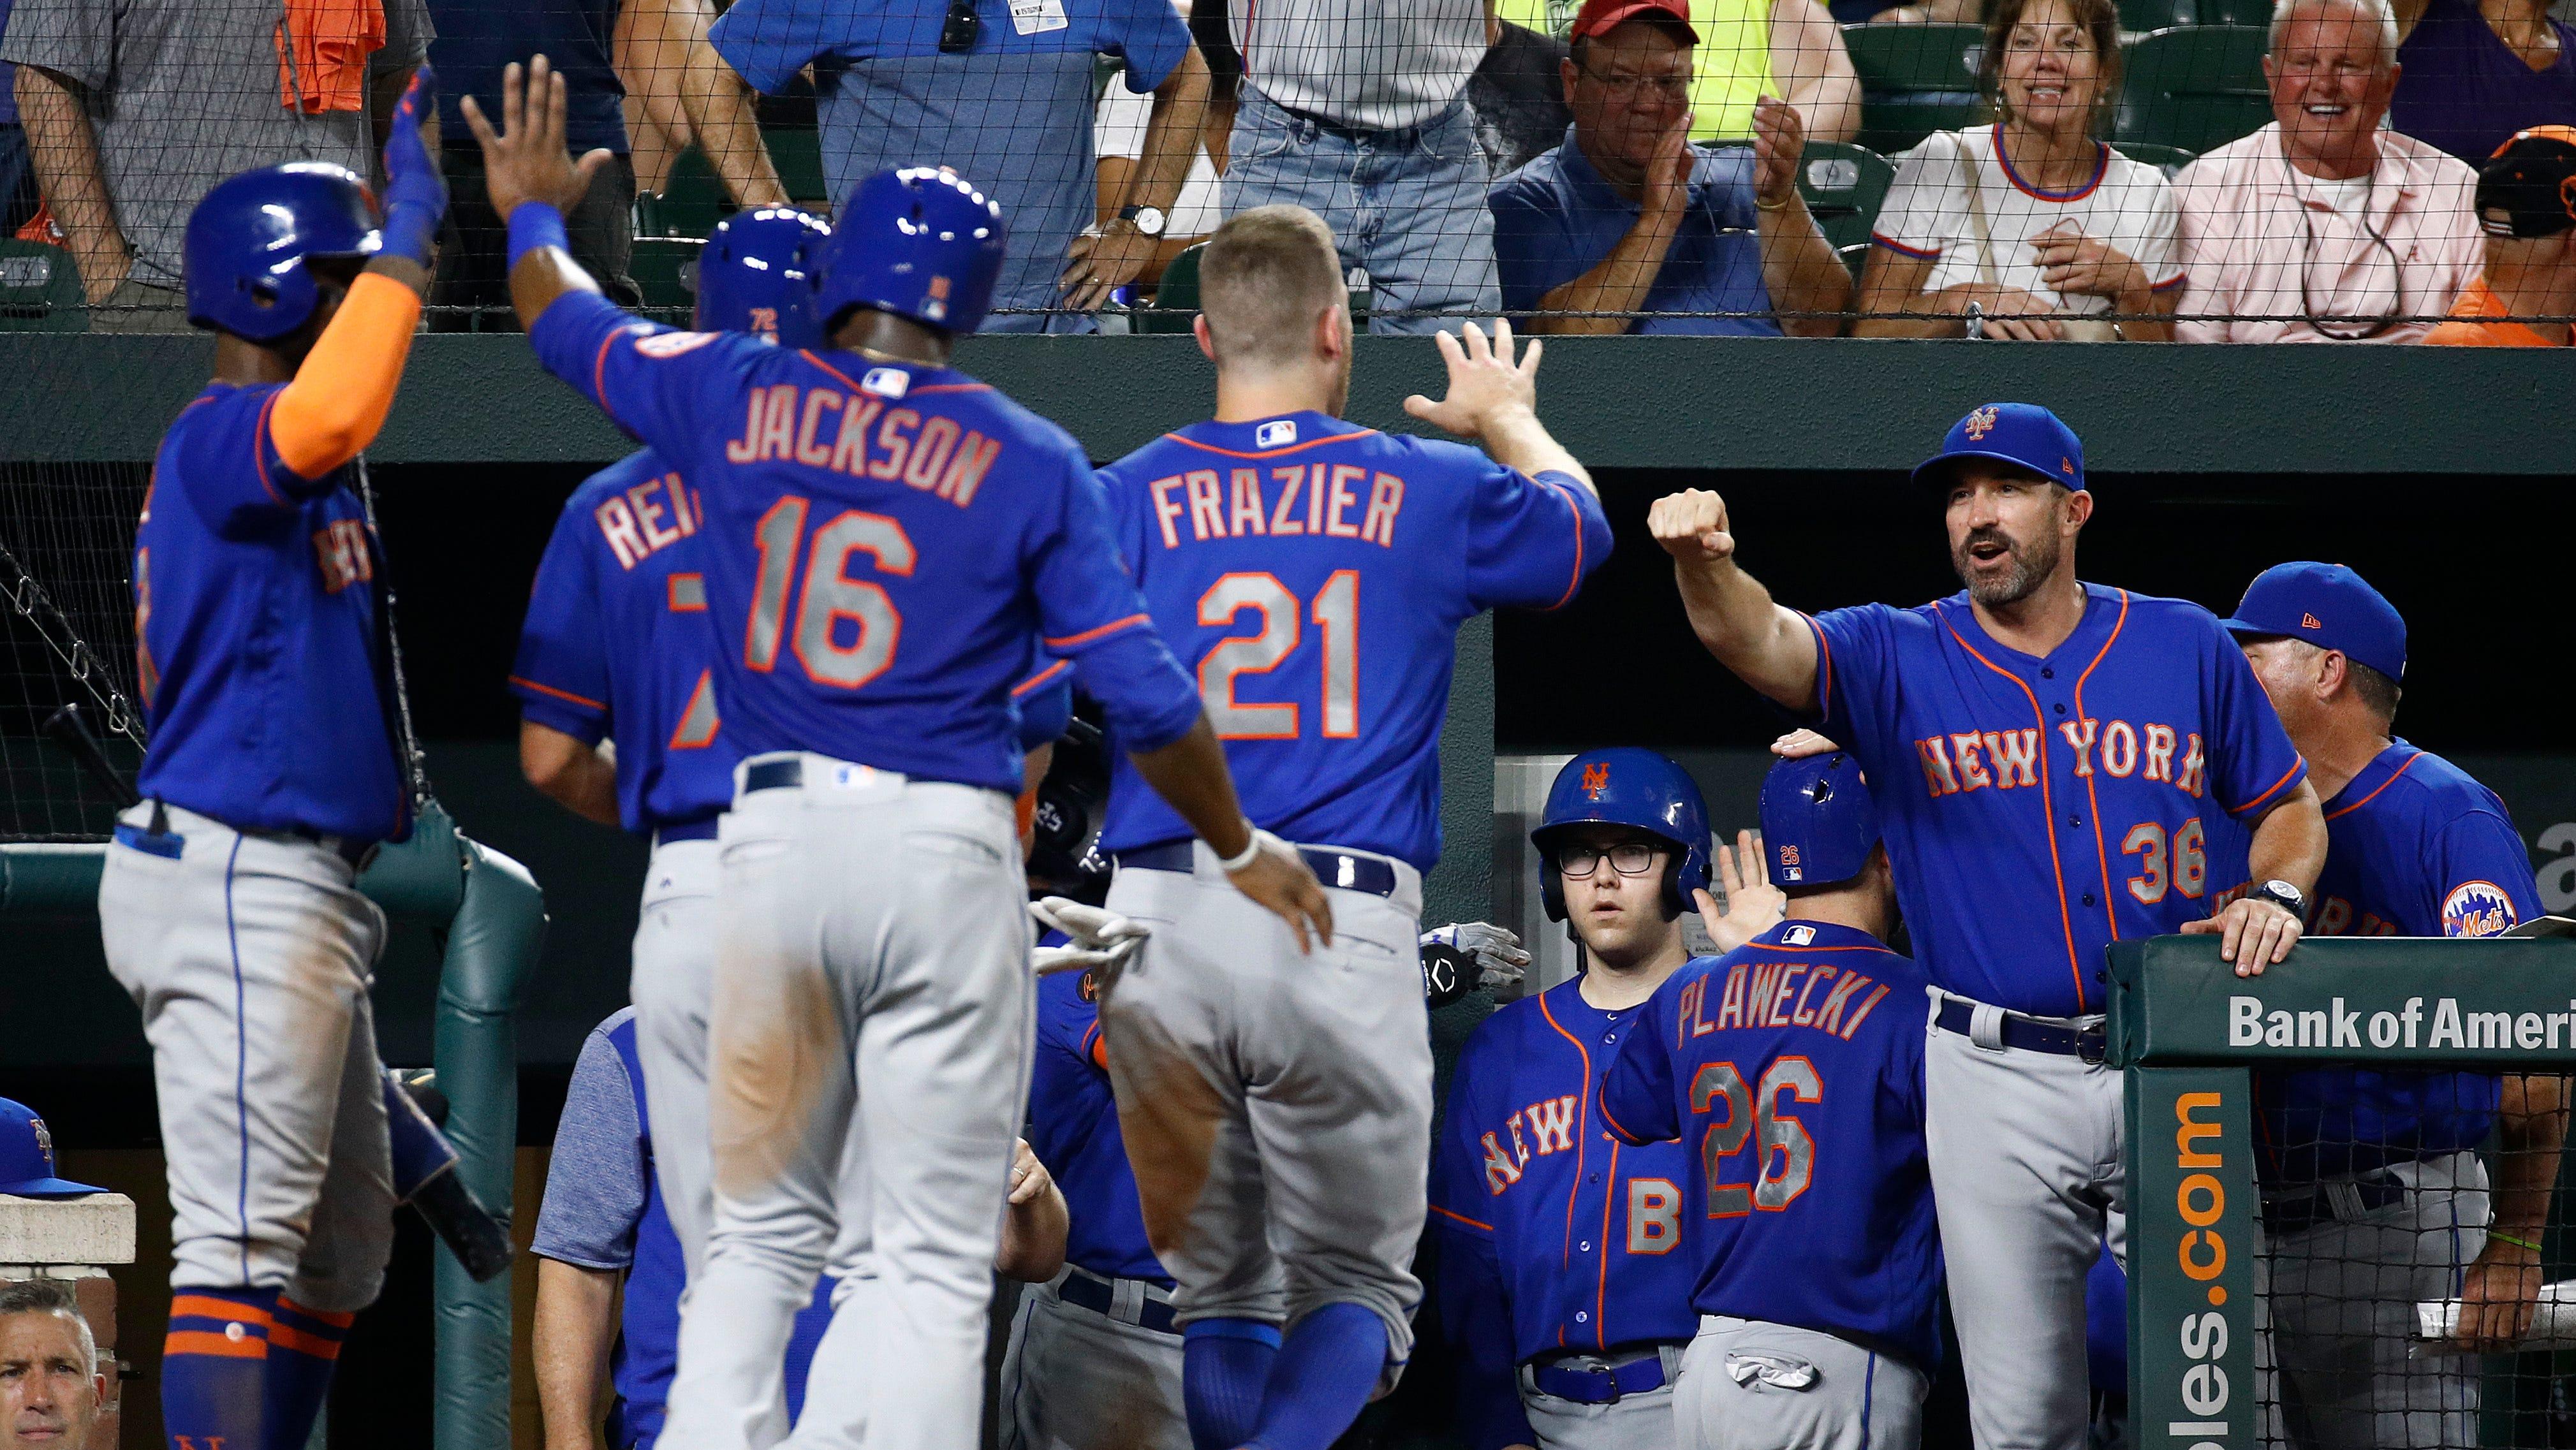 The Mets scored a season-high 16 runs against the Orioles.